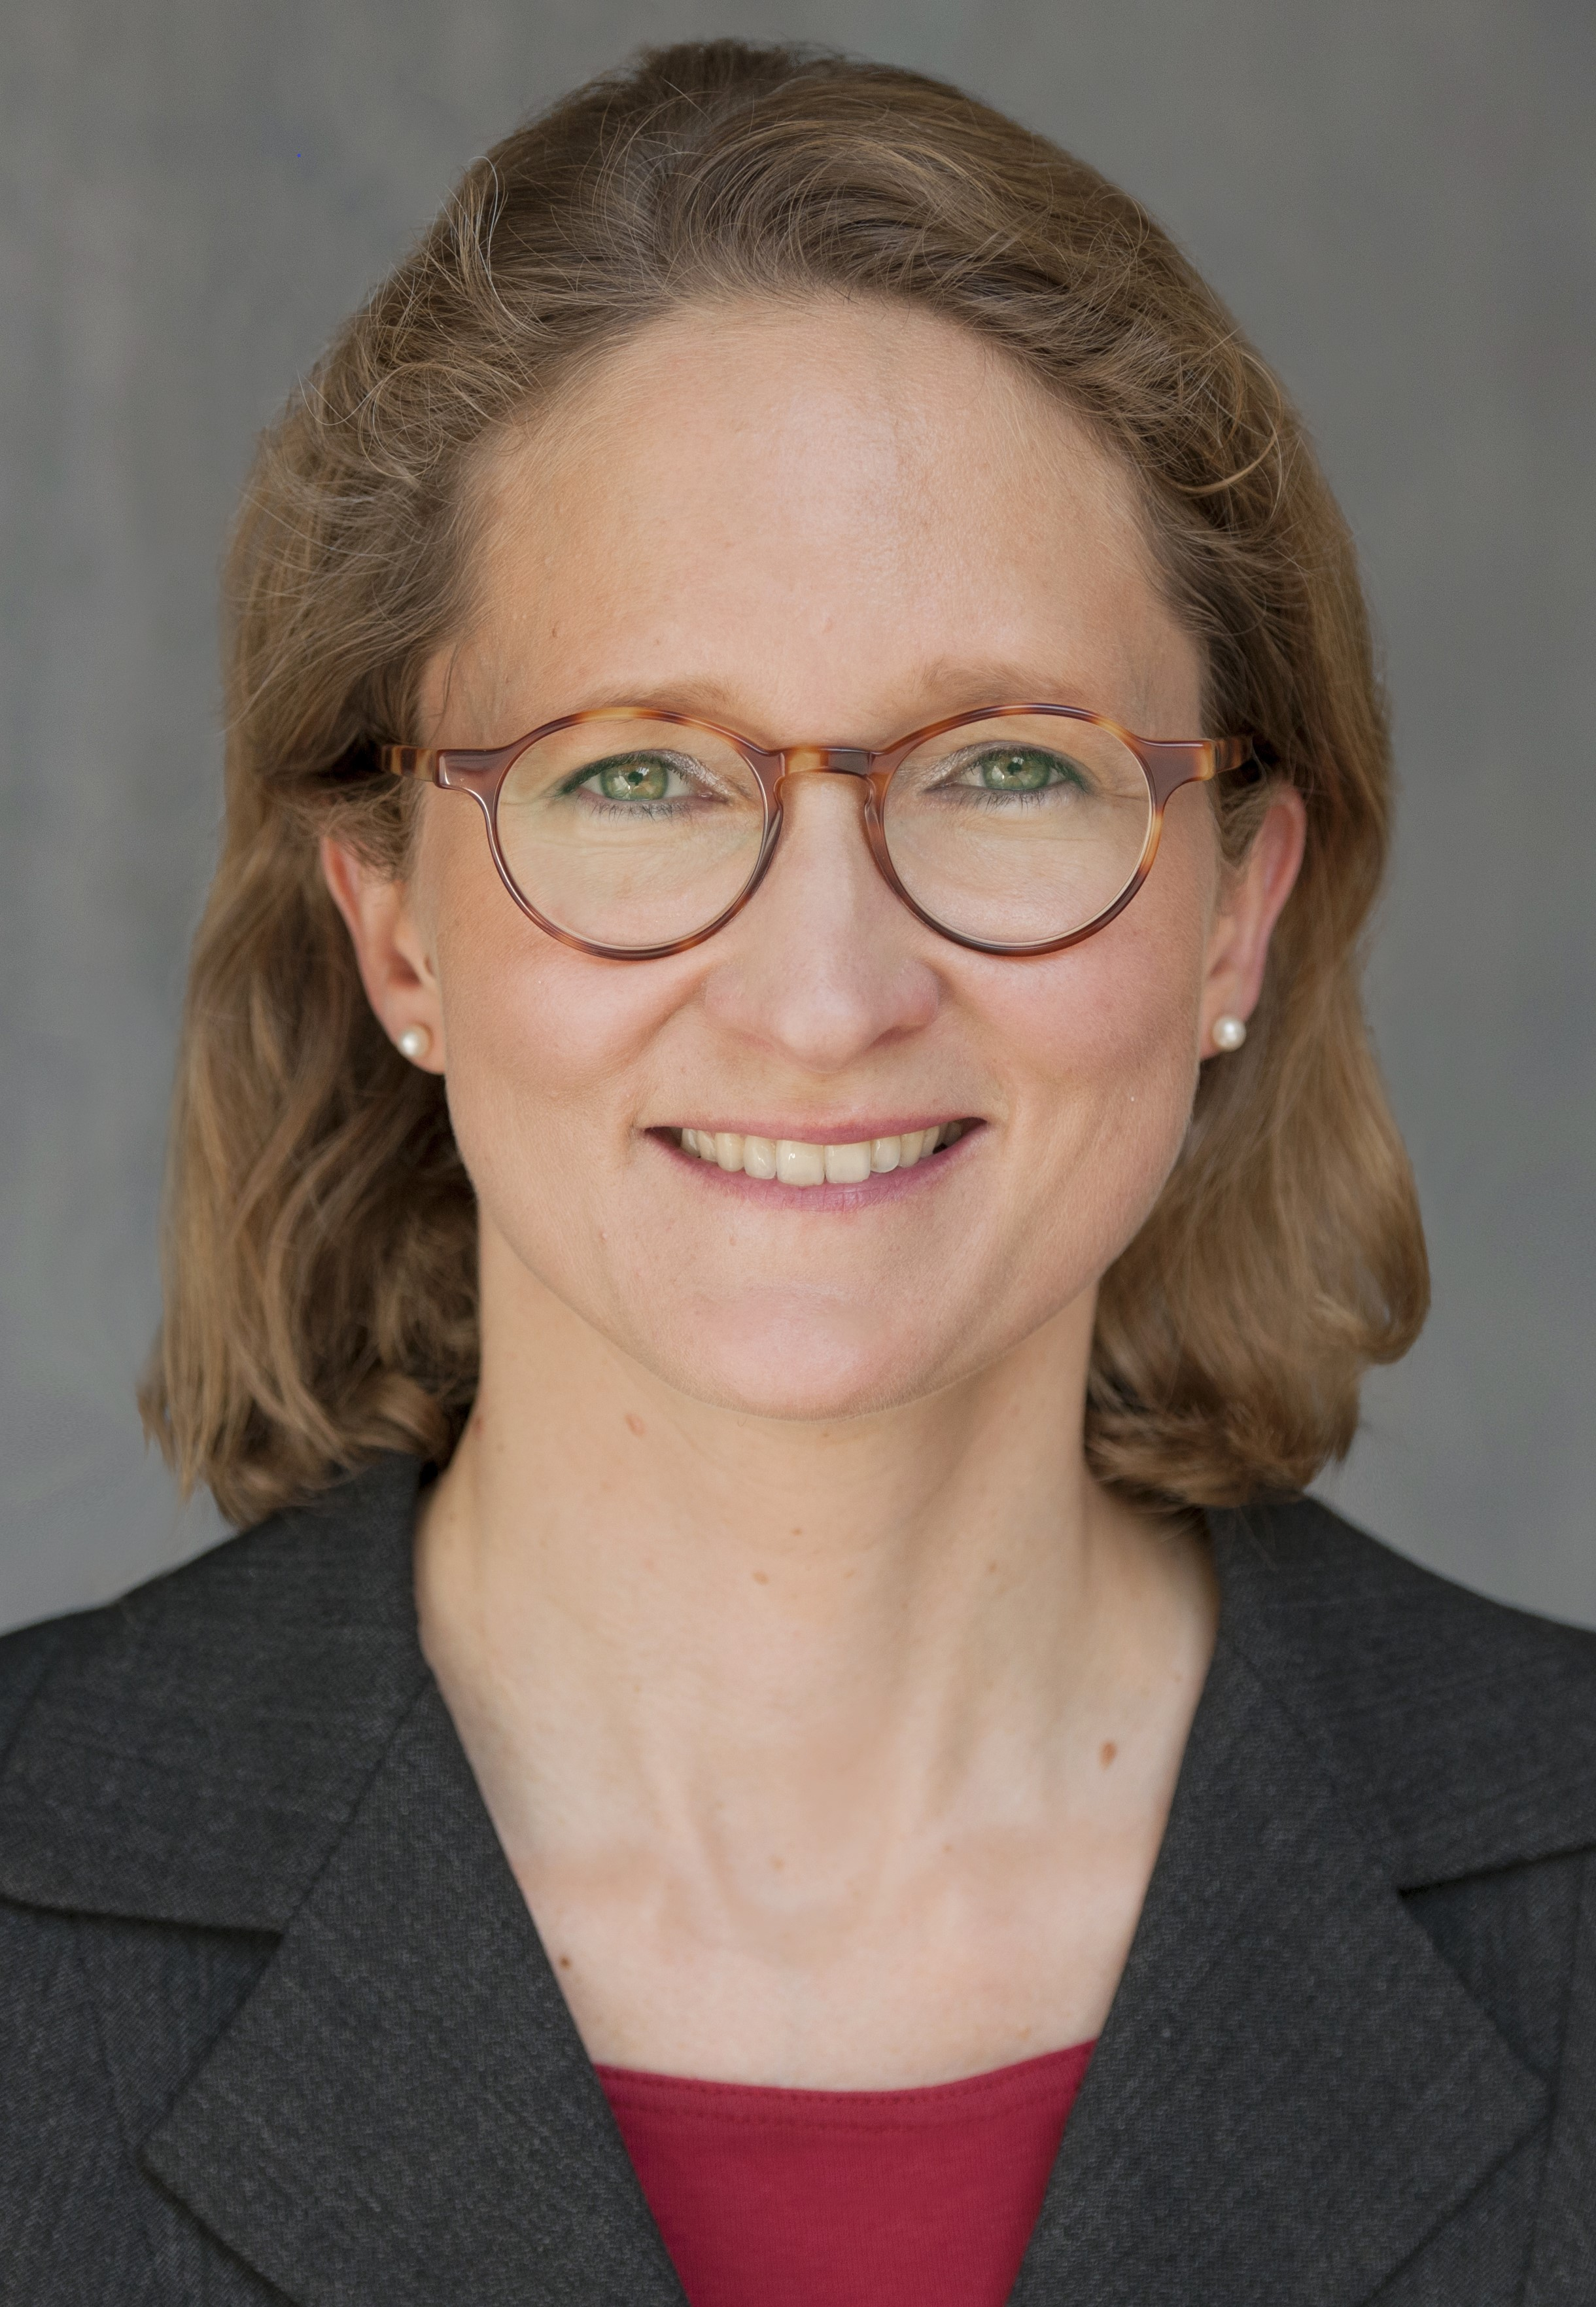 Dr. iur. Anna Keller